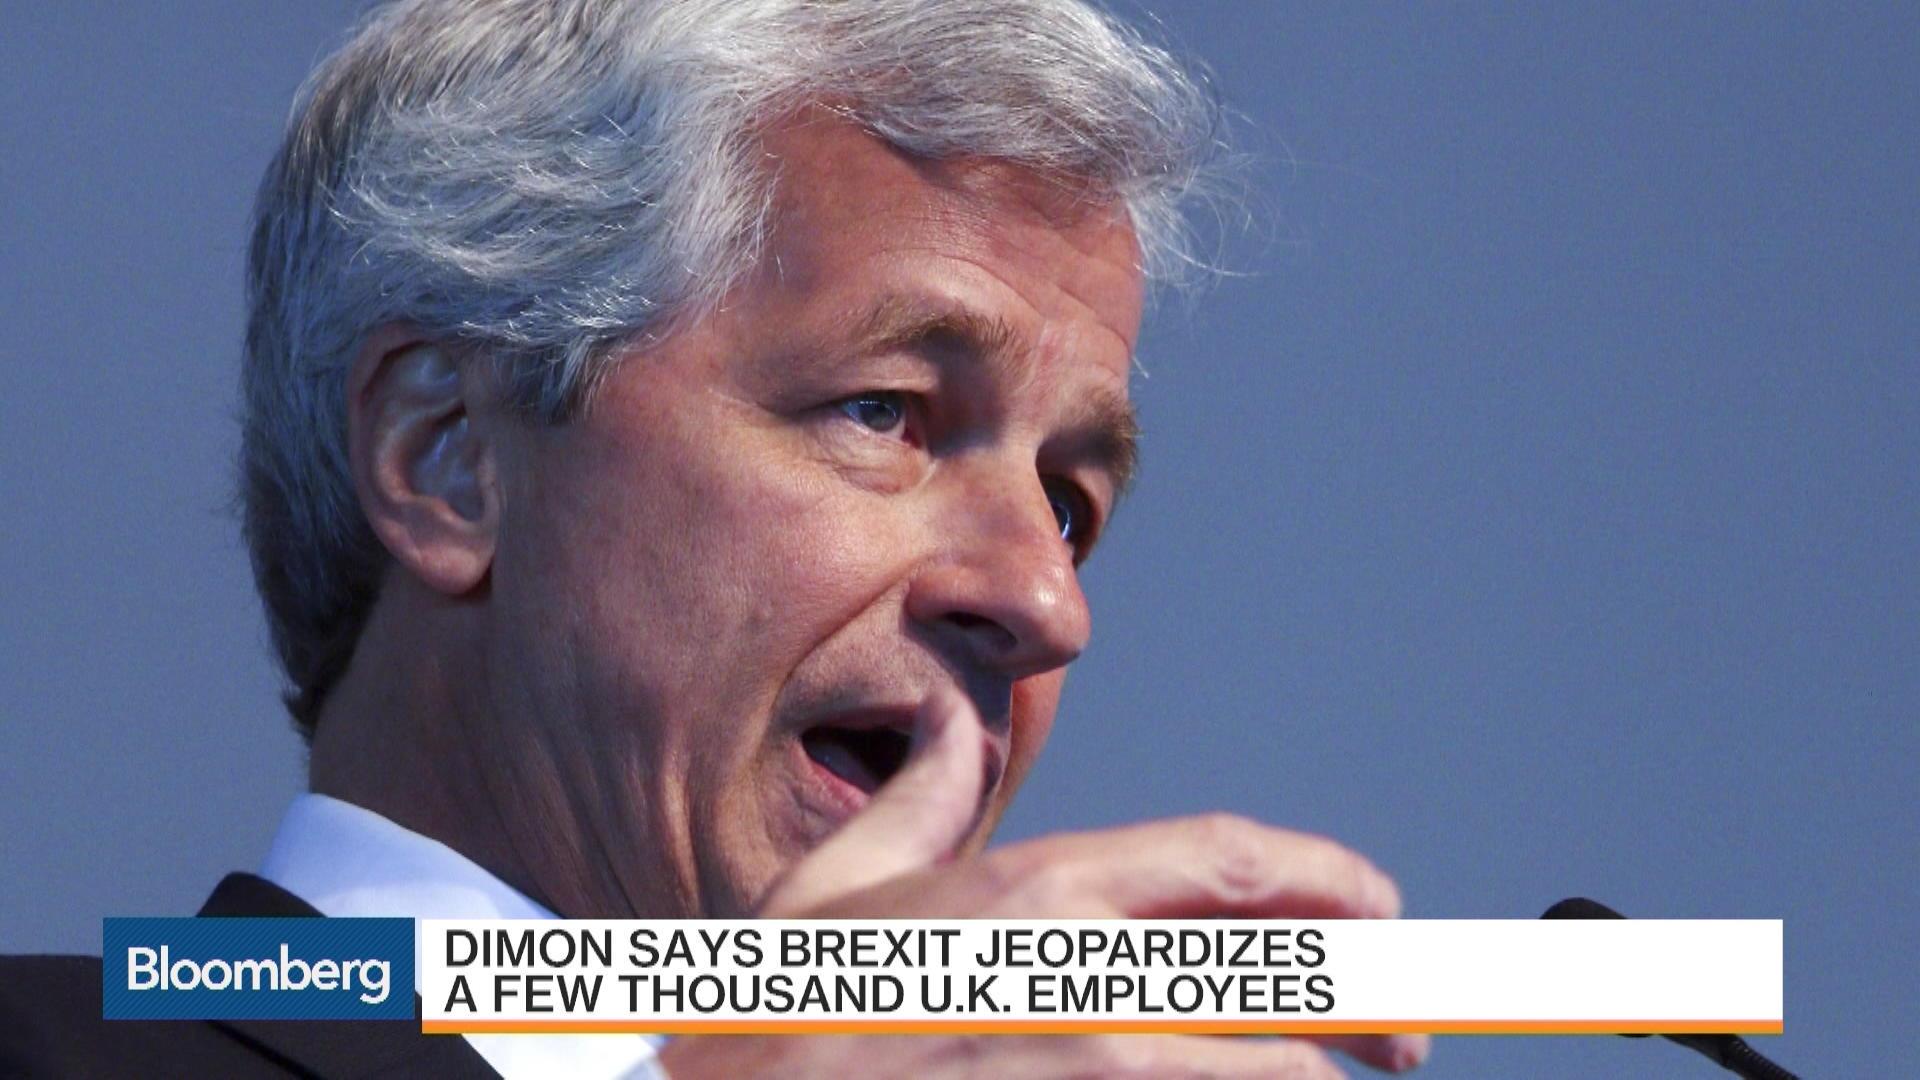 Jpmorgan Ceo Dimon Warns Of Brexit Job Losses Bloomberg